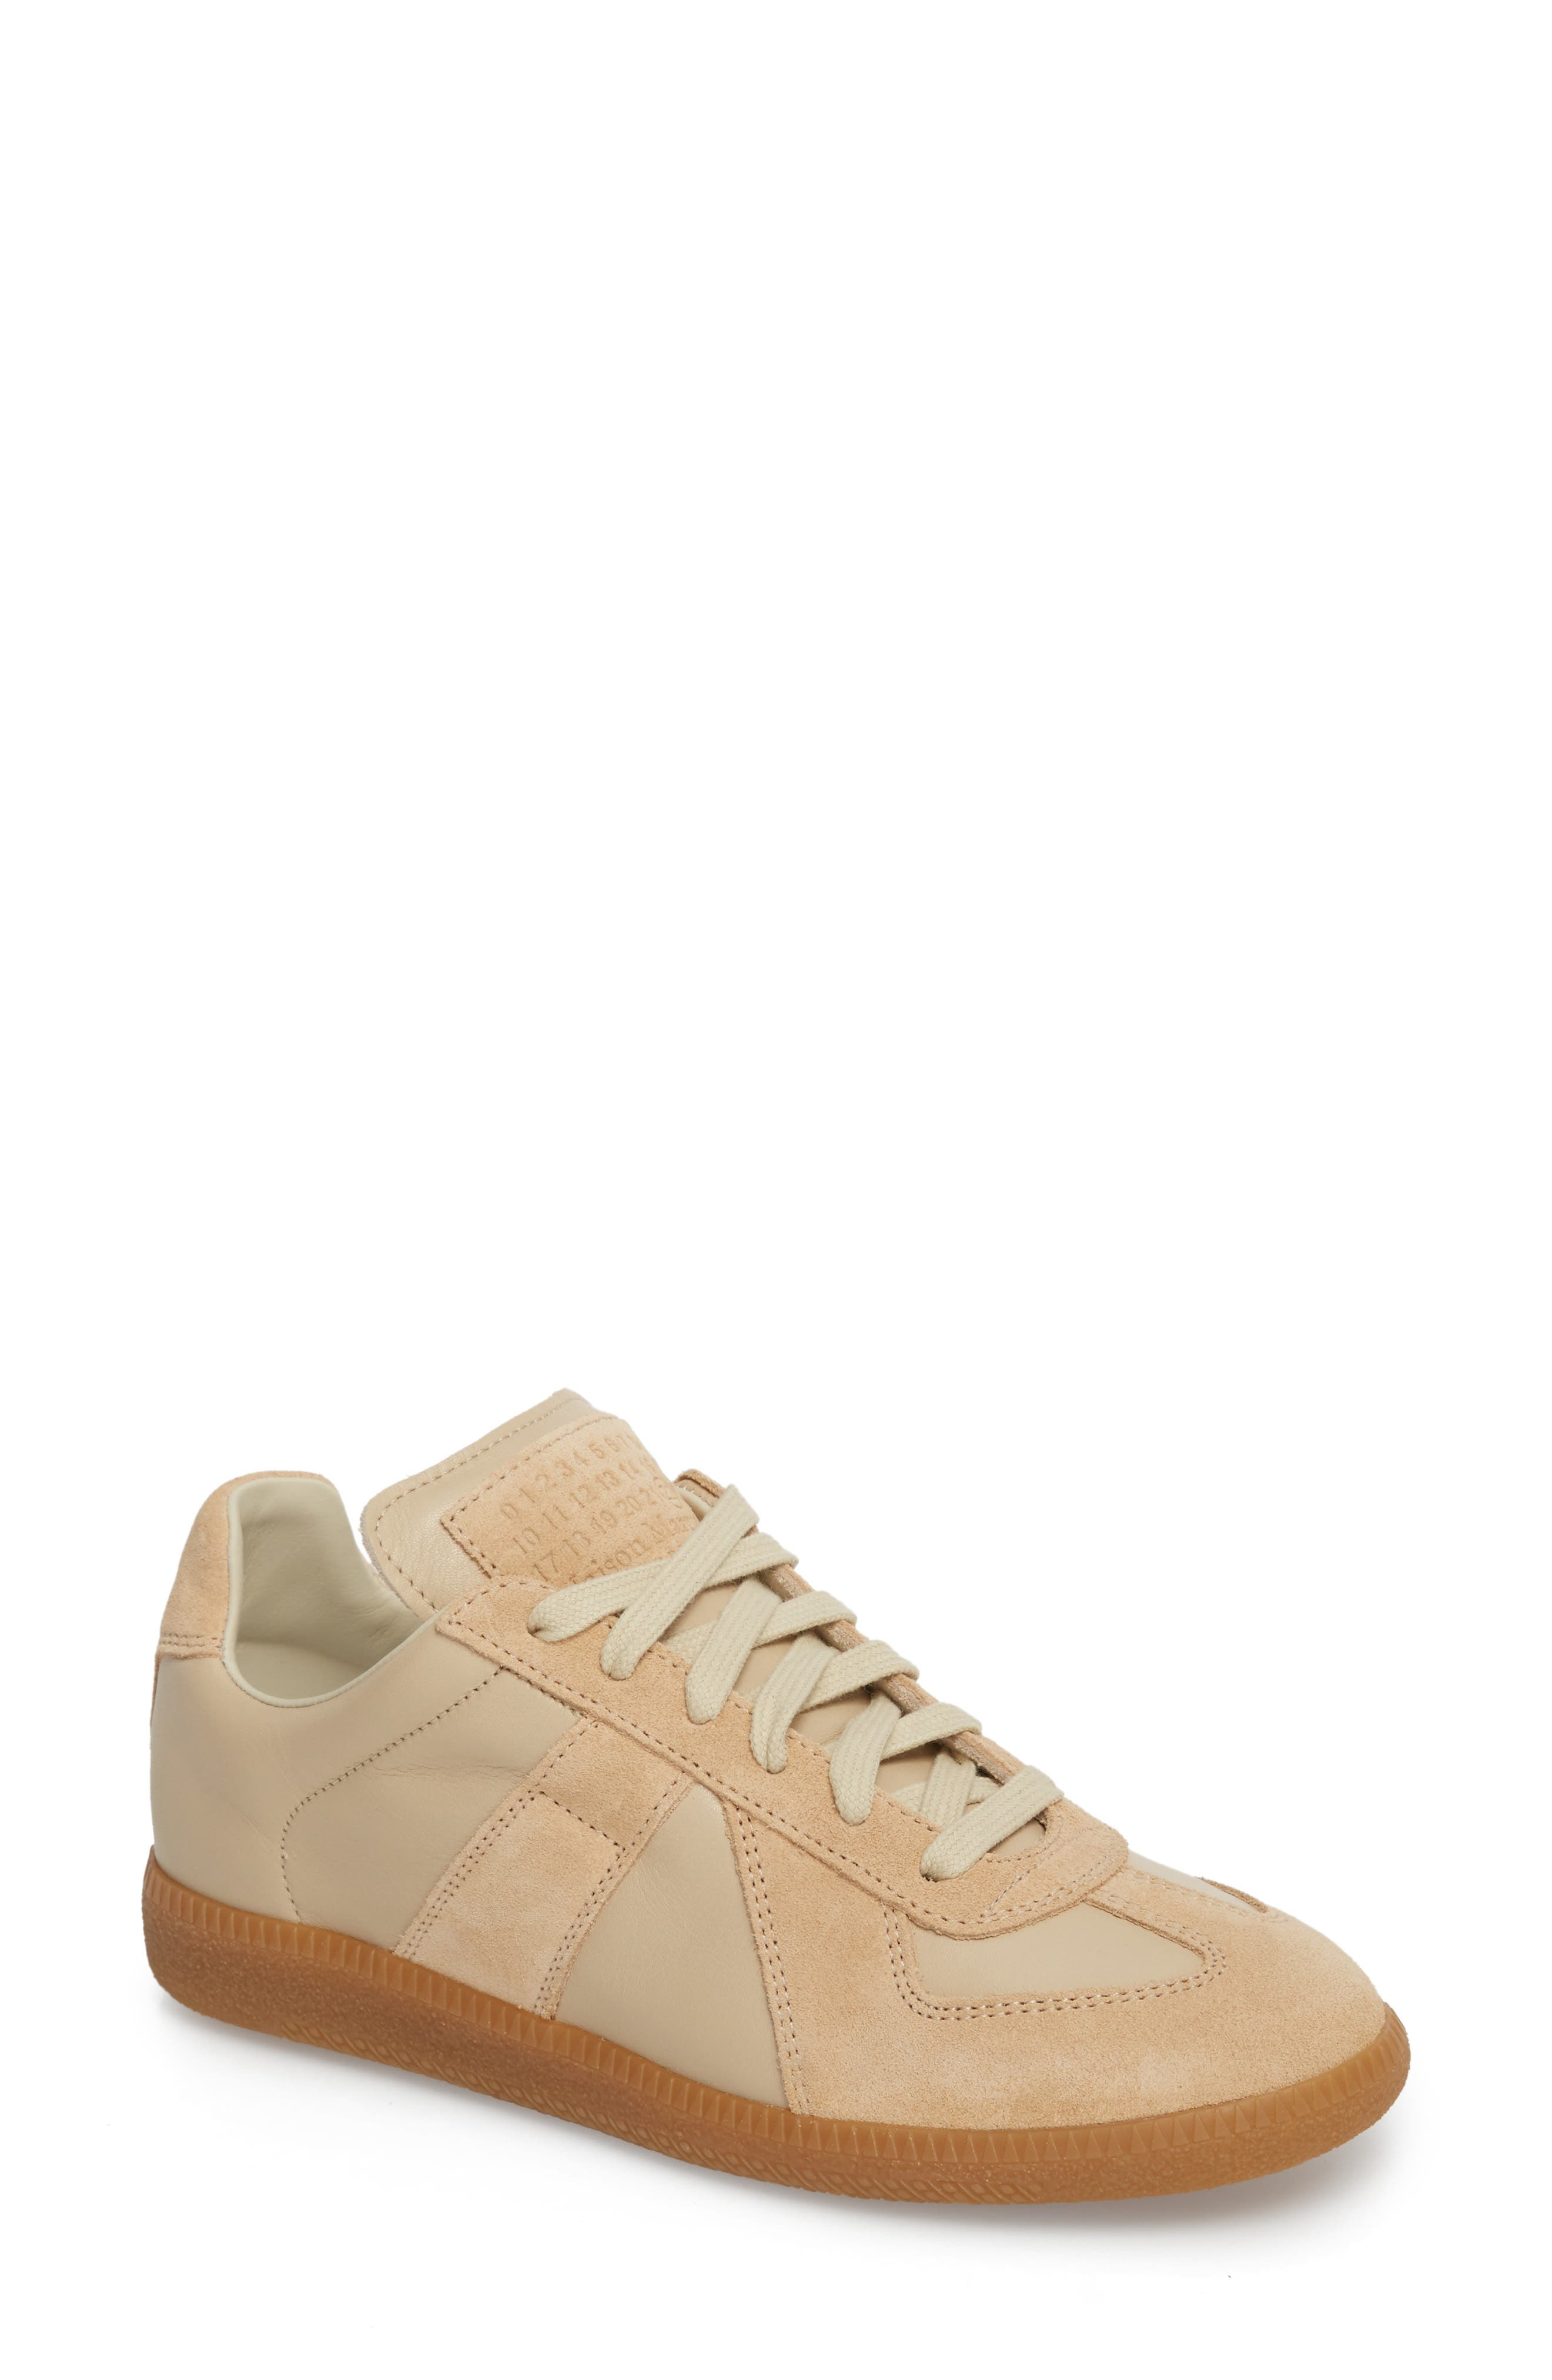 MAISON MARGIELA,                             Replica Sneaker,                             Main thumbnail 1, color,                             262